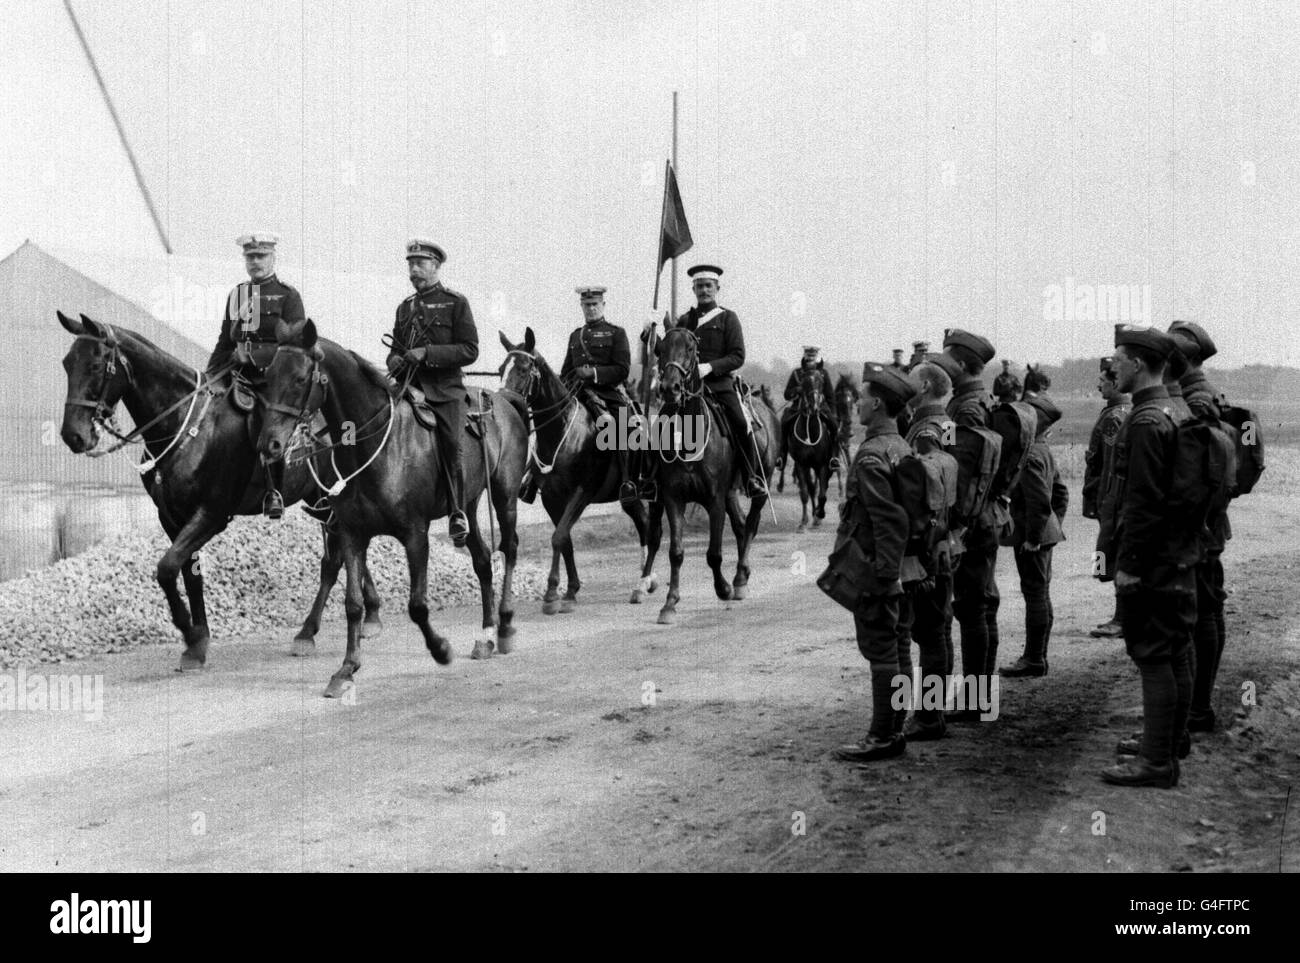 War - First World War - Royal Flying Corps - Farnborough - Stock Image